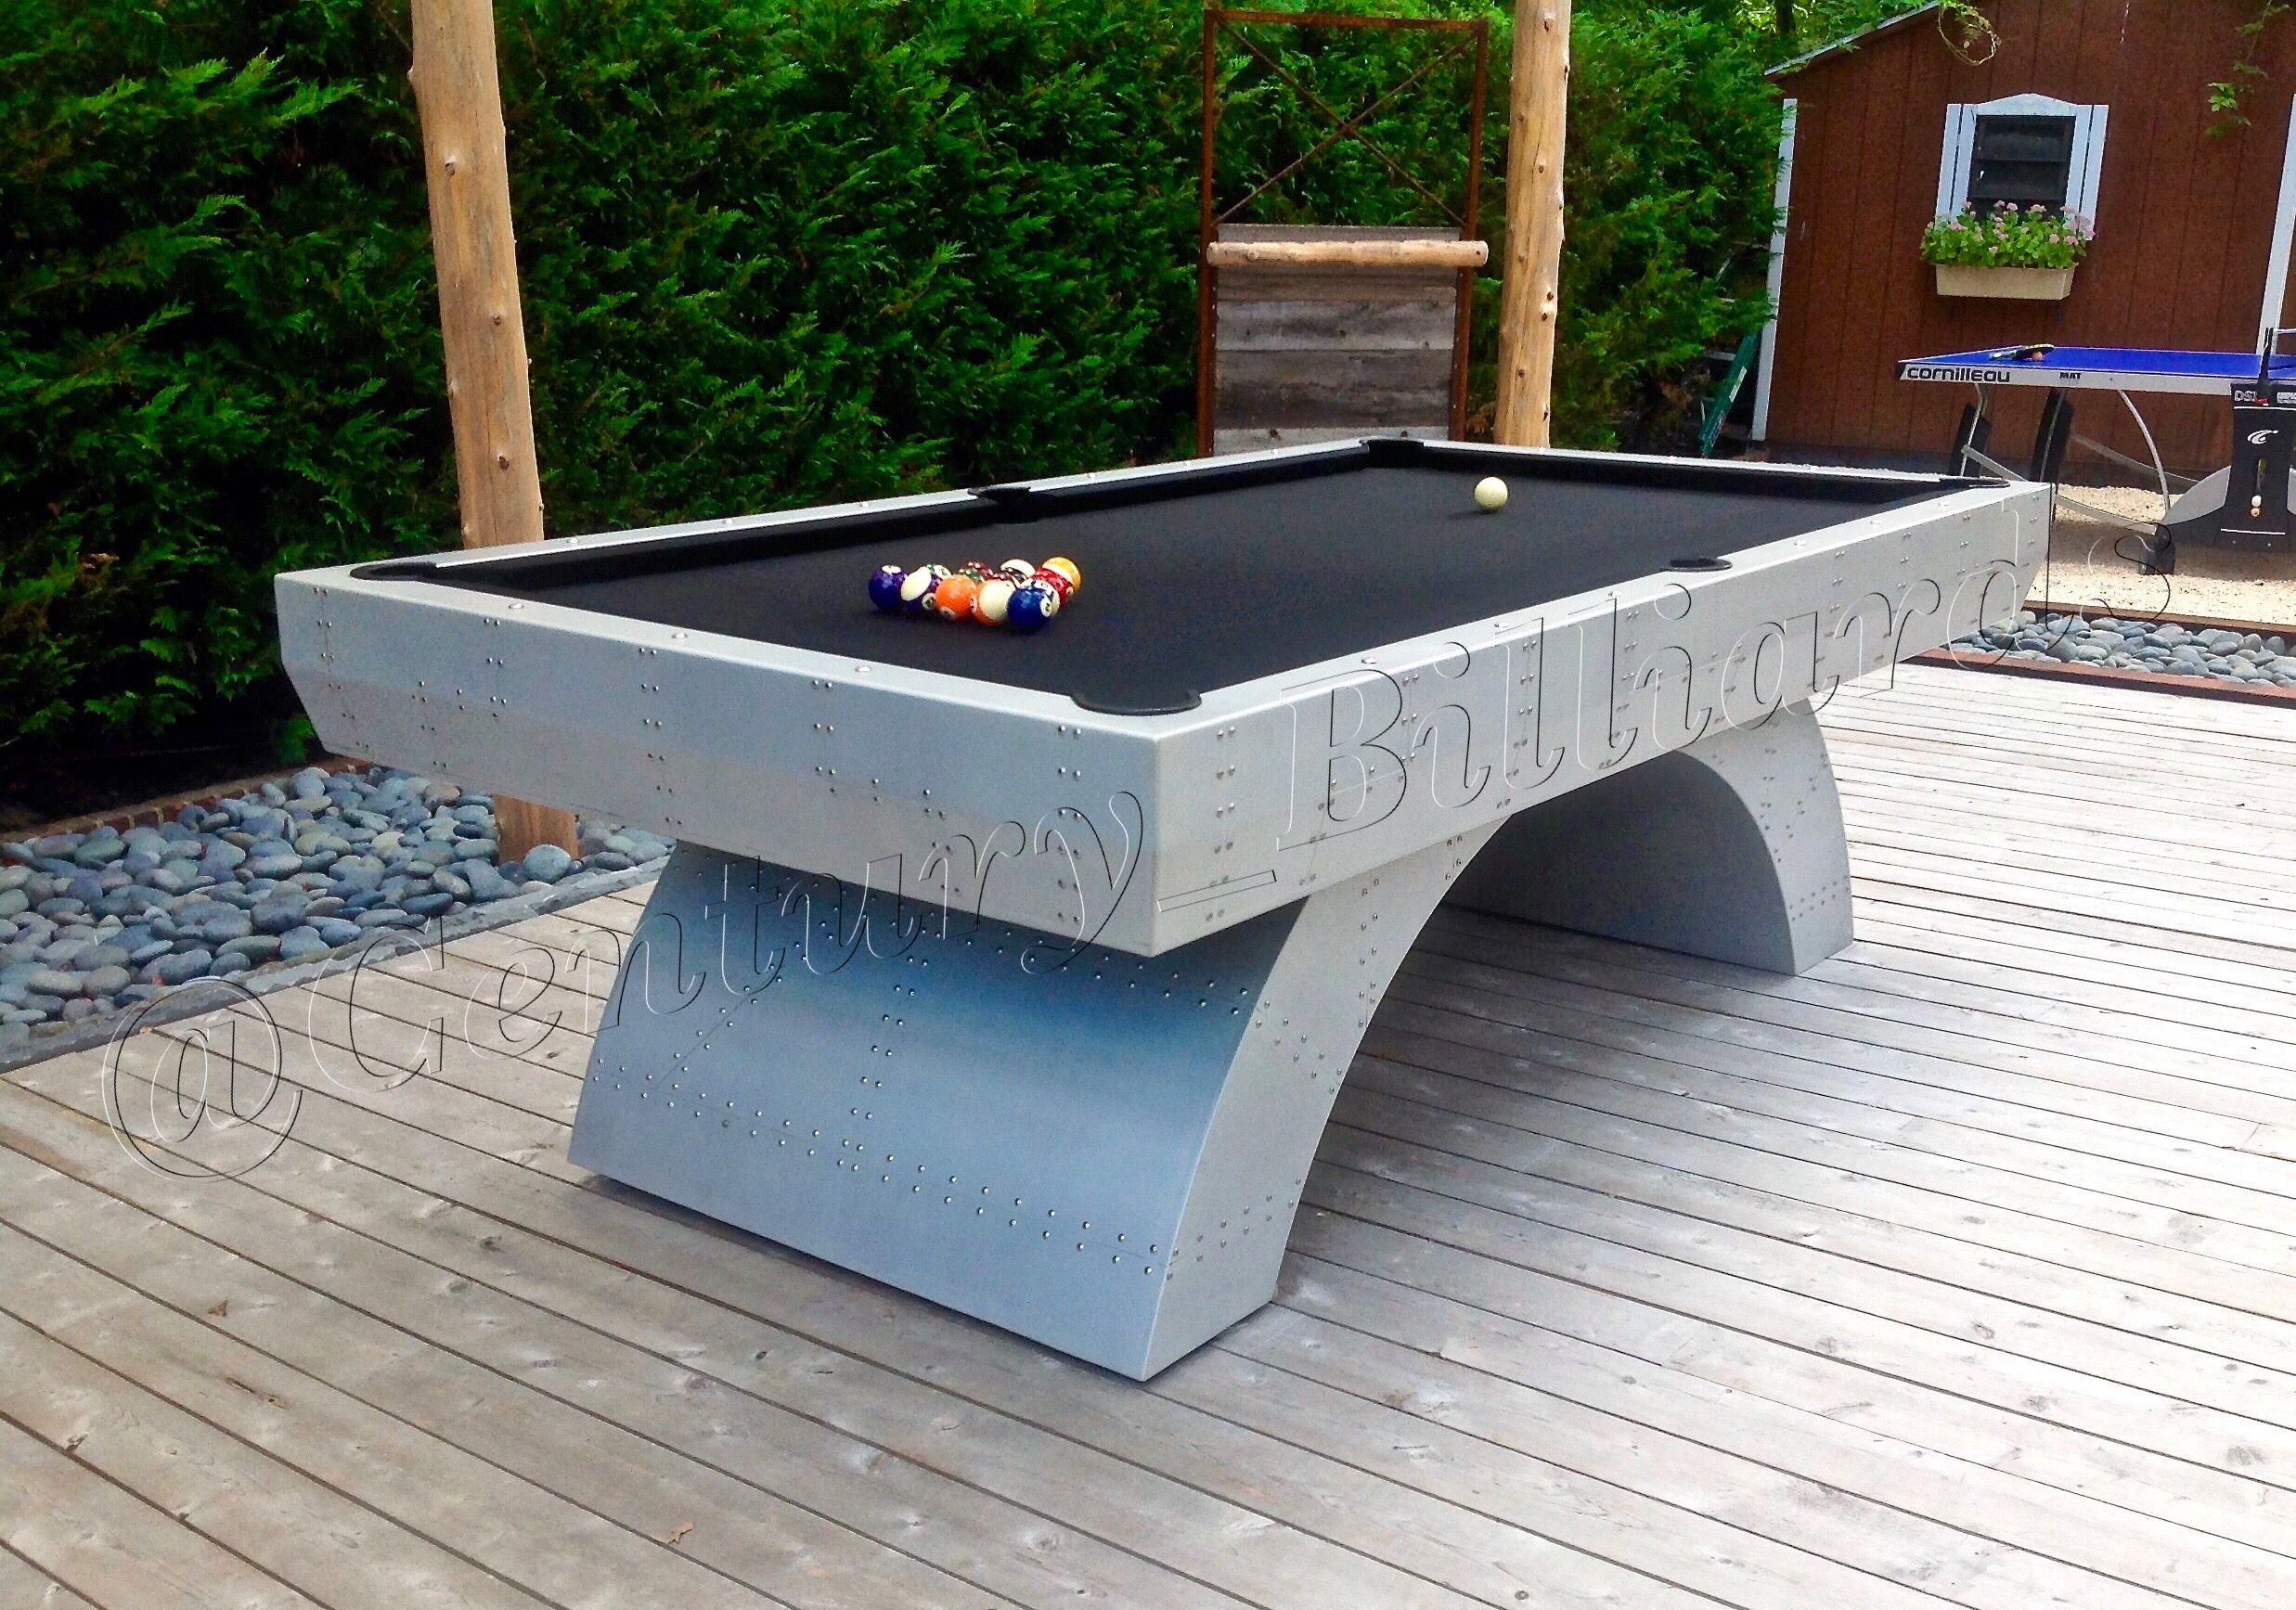 Soho Outdoor Pool Table Outdoor Pool Table Outdoor Living Design Outdoor Pool